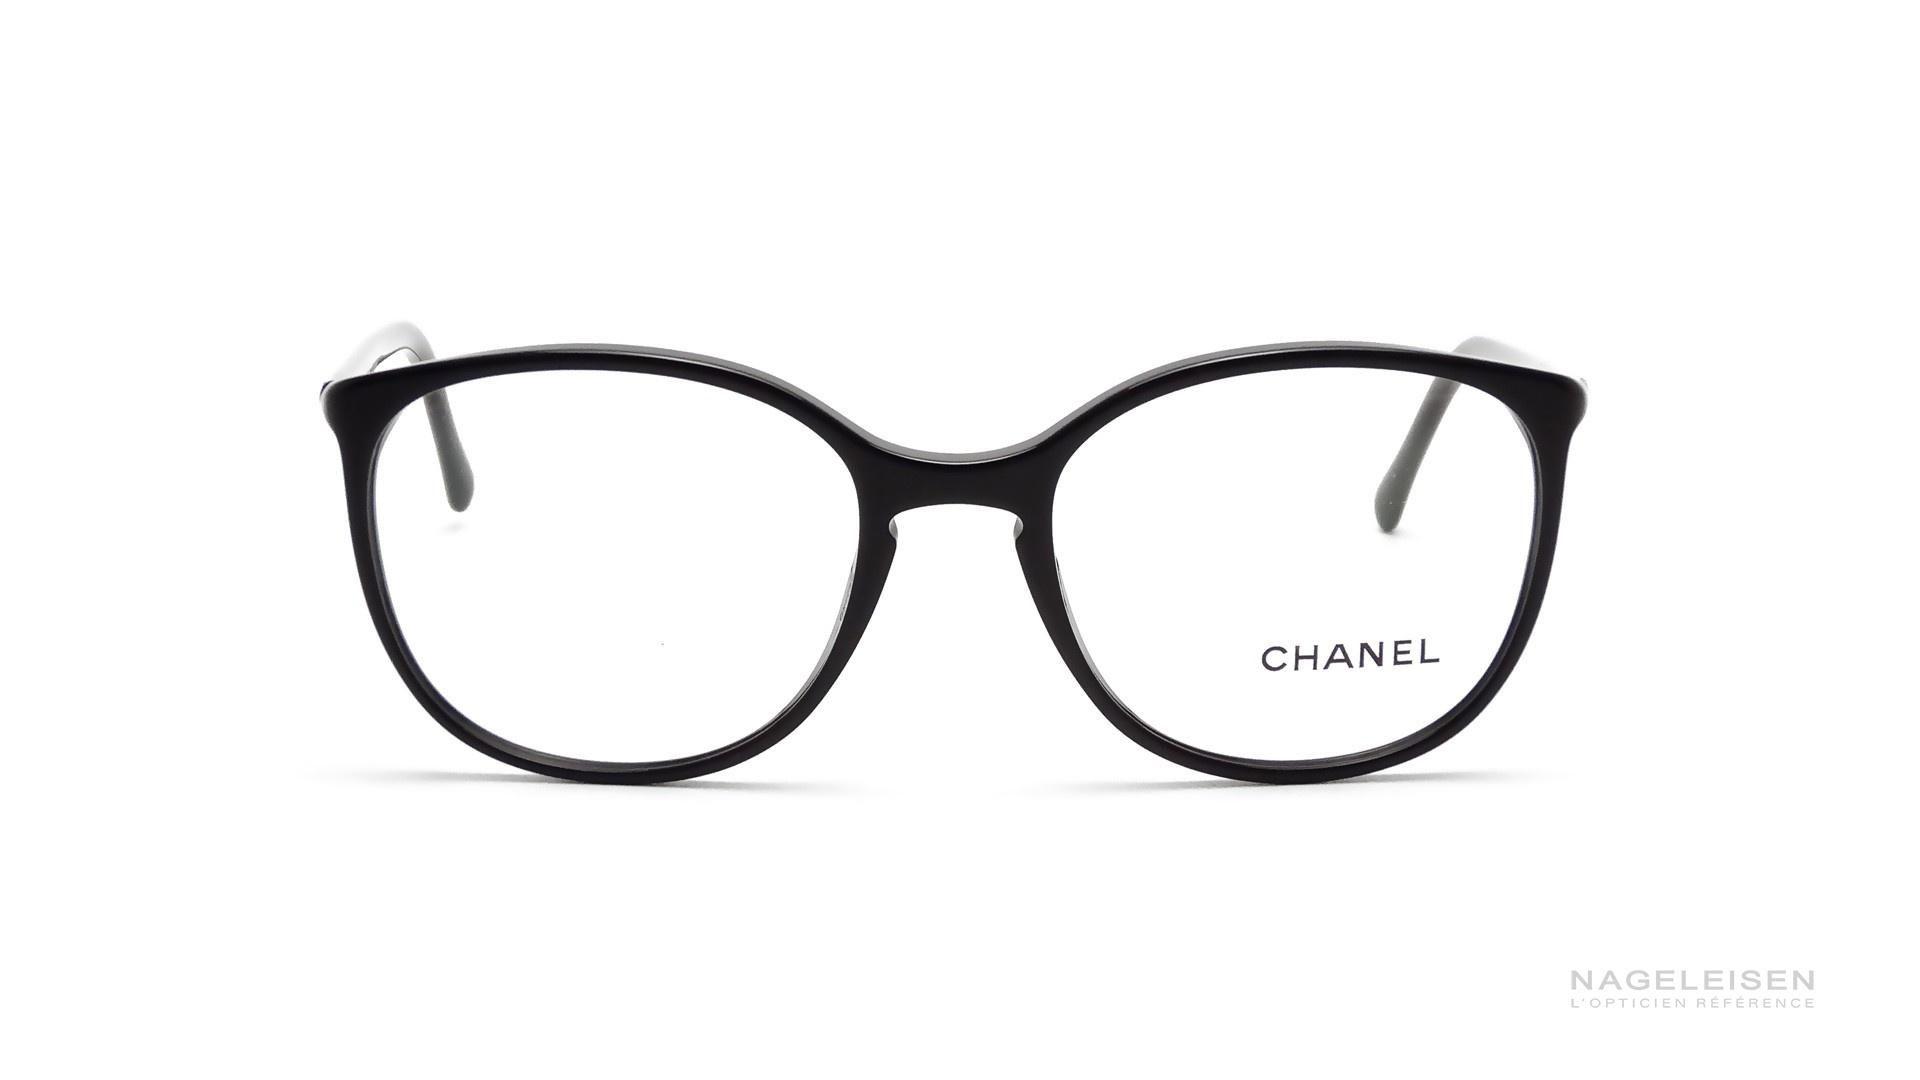 Lunettes de vue Chanel CH 3282 C501 Noir Medium   SUN☆SAND ☆SEA in ... 139f0f6a01c1